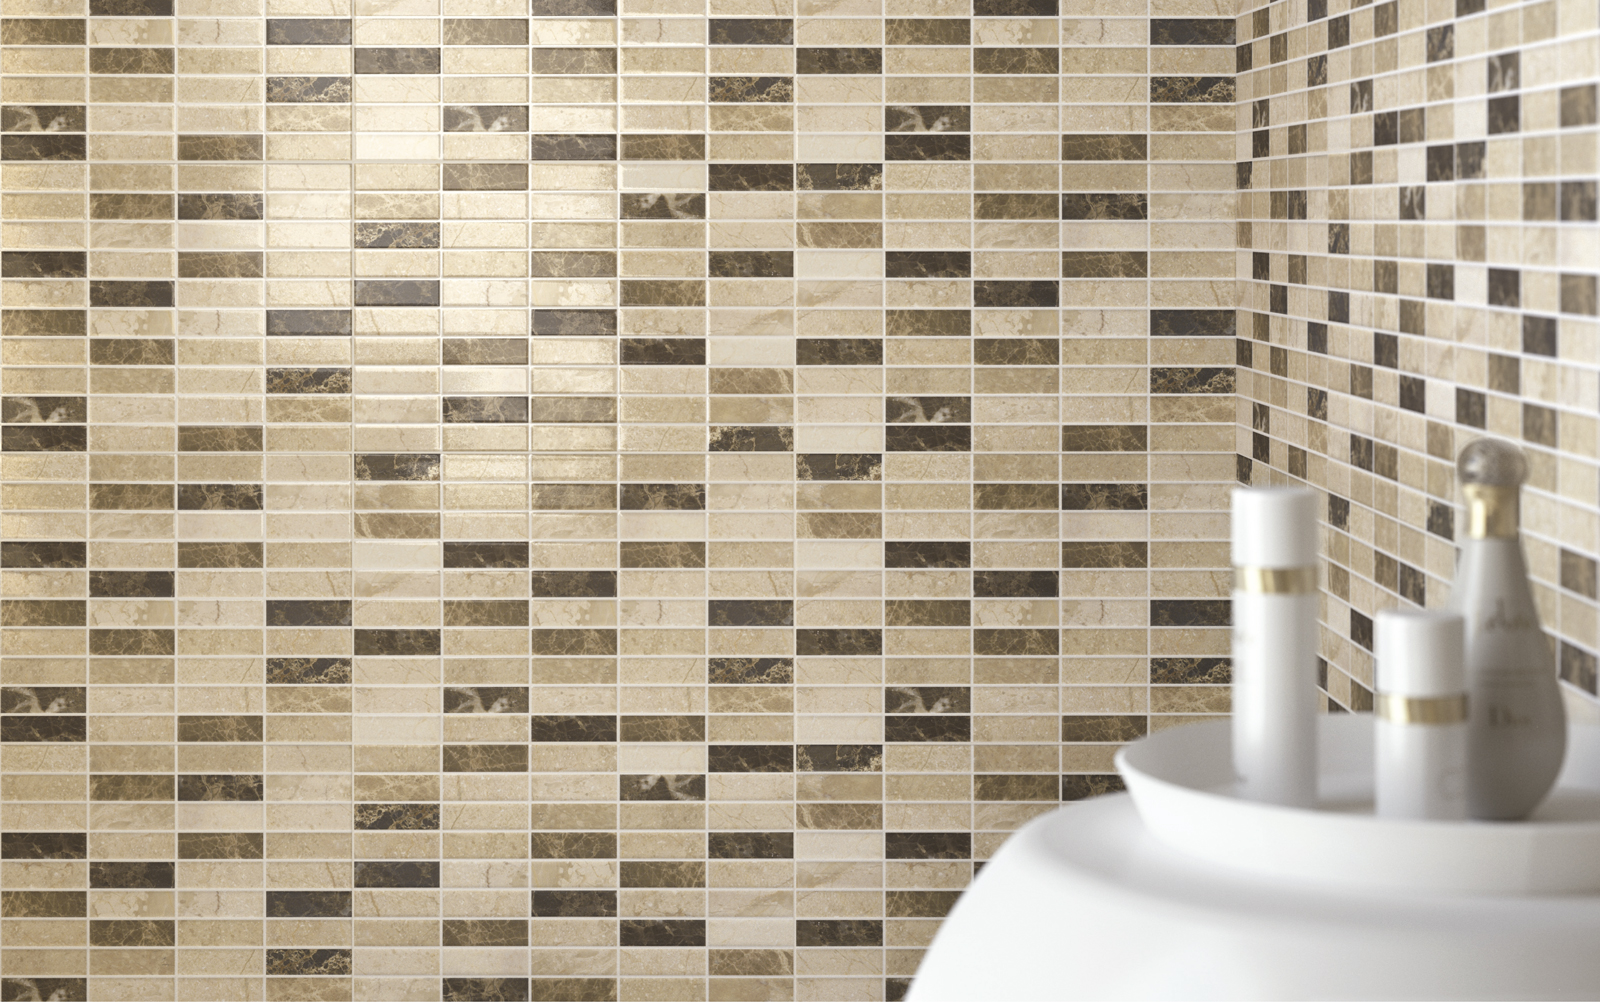 Collezione game mosaici di ceramica per bagno e cucina - Piastrelle a mosaico per cucina ...